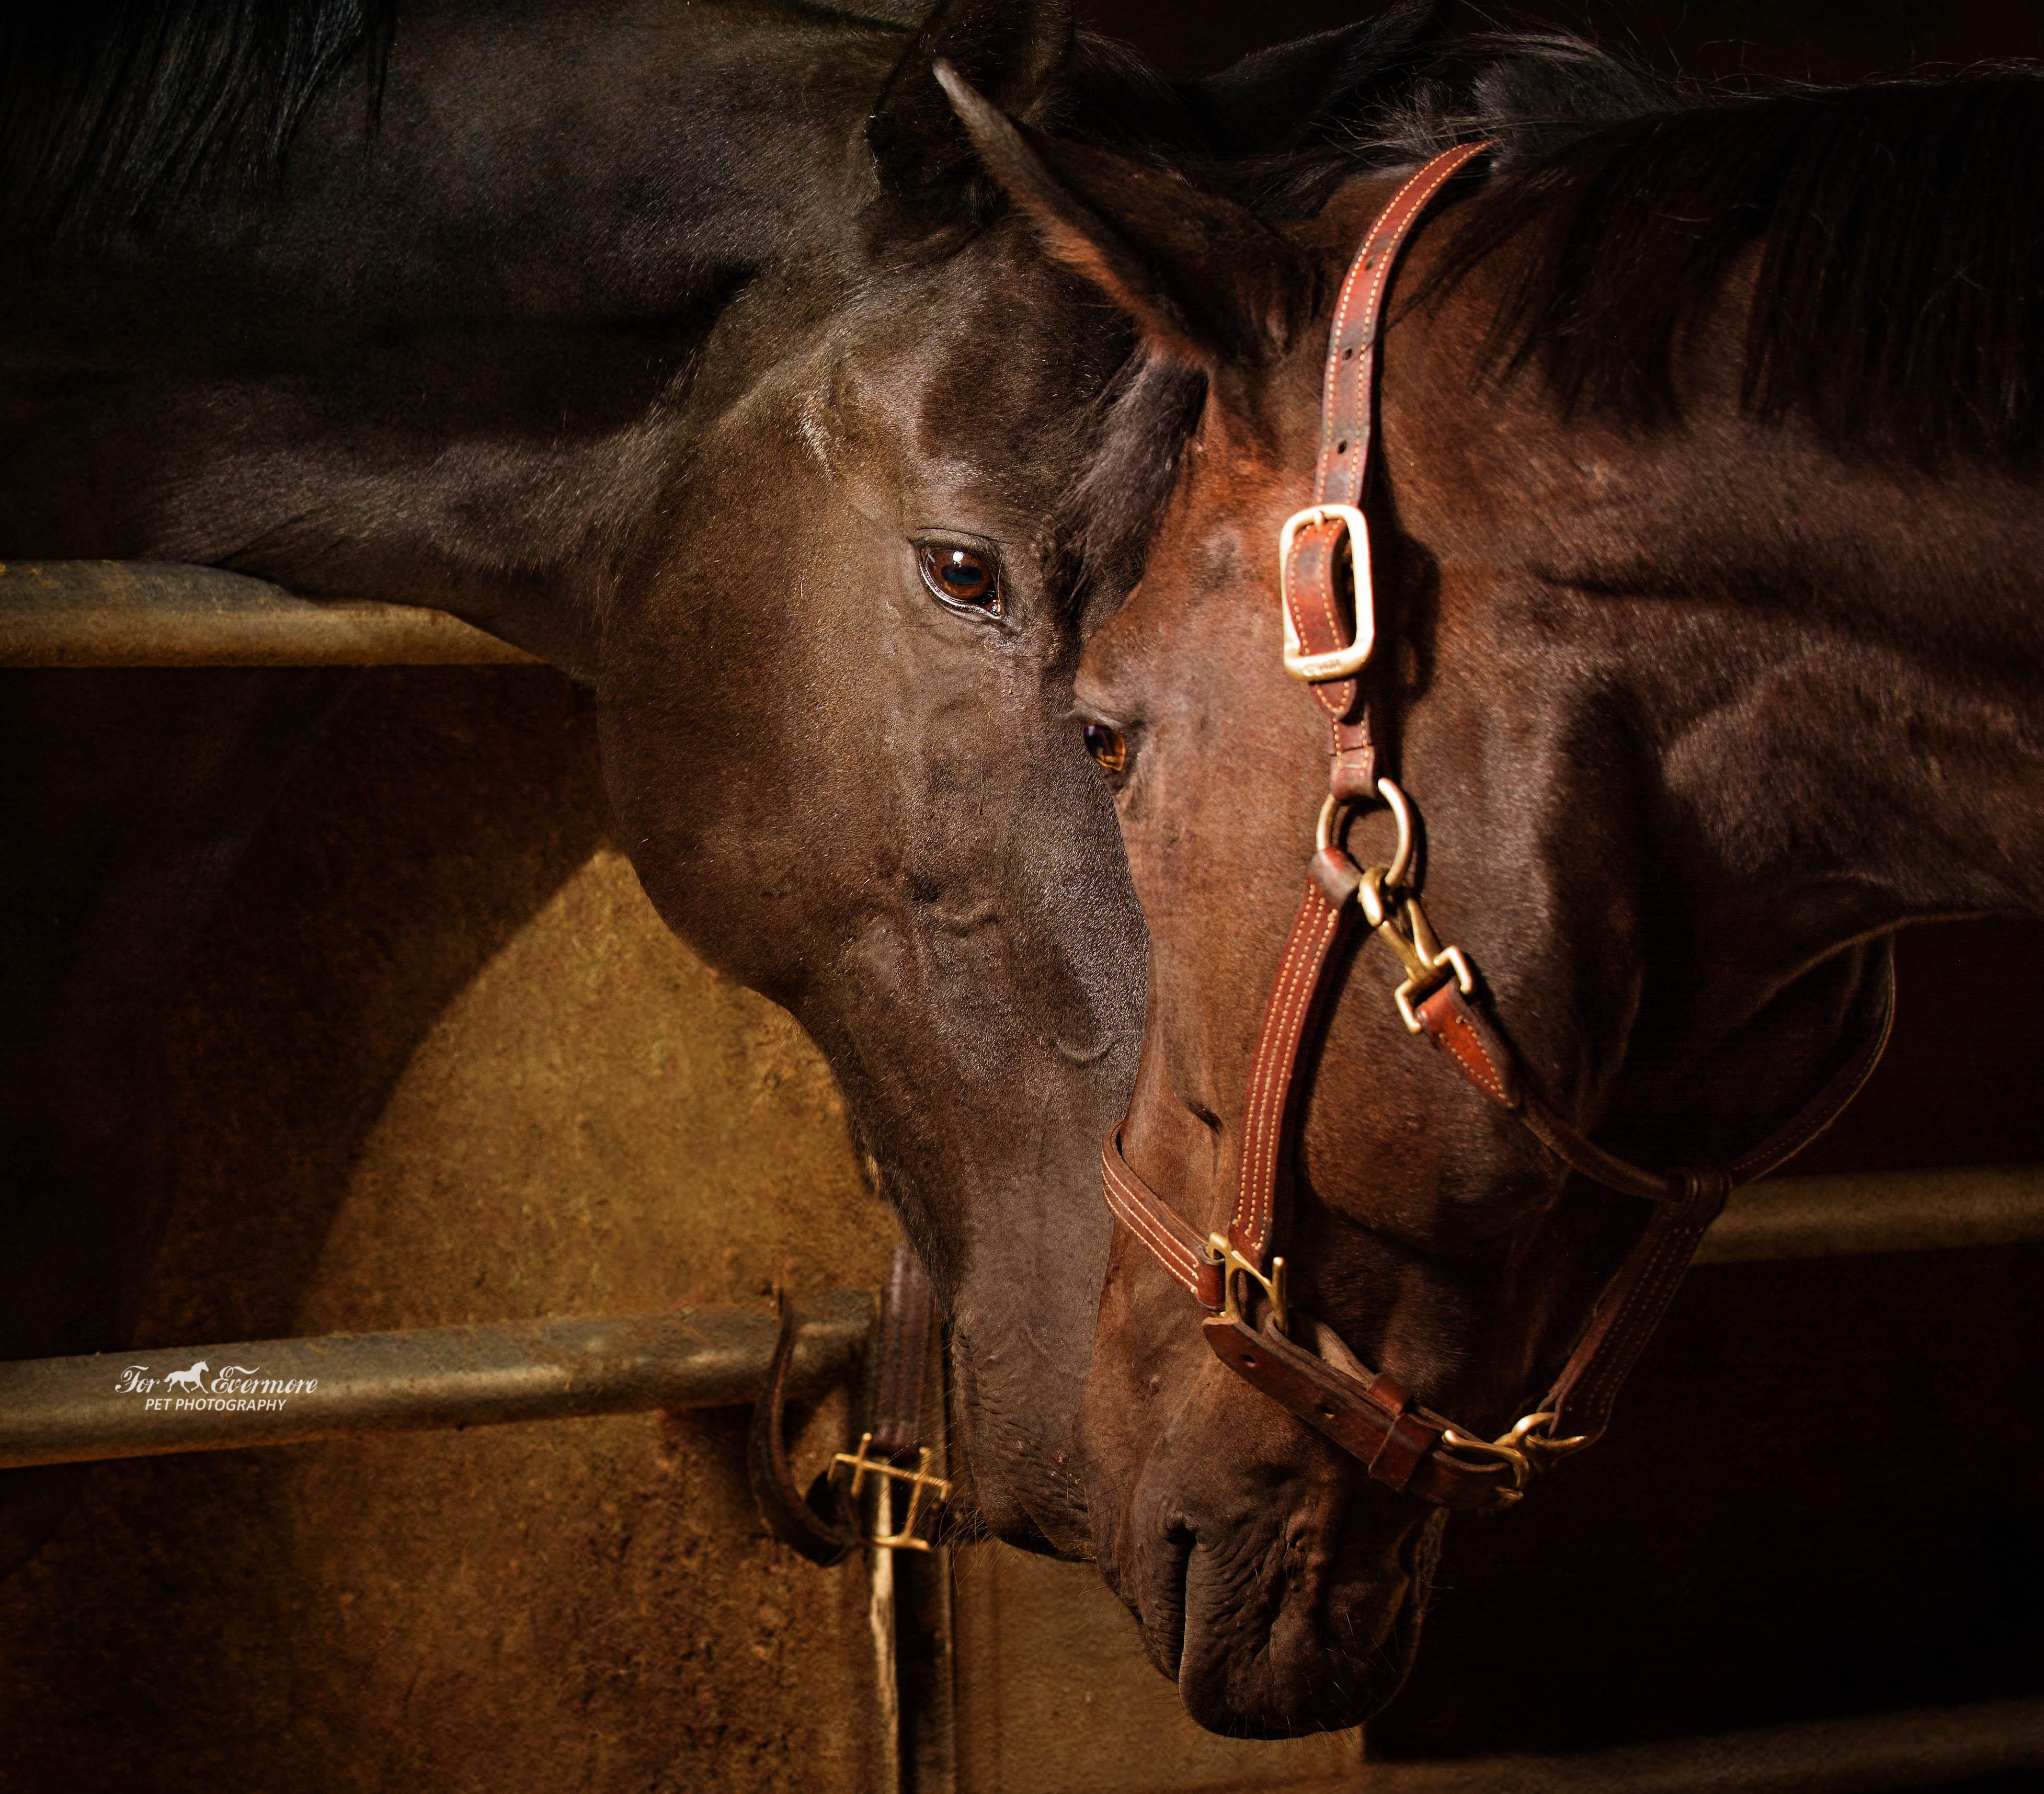 Horses sharing a special bond